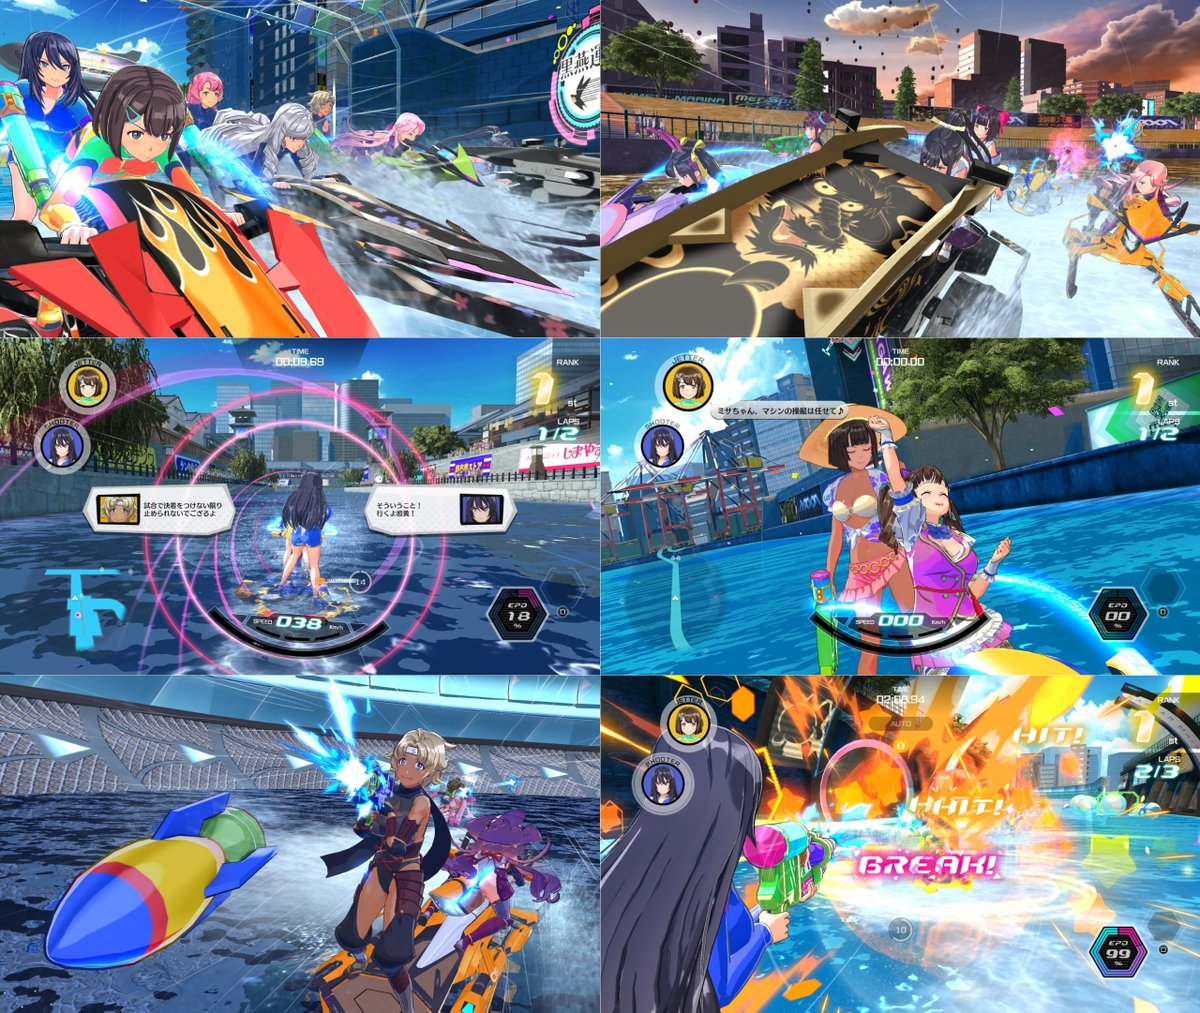 EFMUY0zU0AAD4lO - カグラ高木最新作、PS4『神田川JET GIRLS』2020年1月16日発売決定!